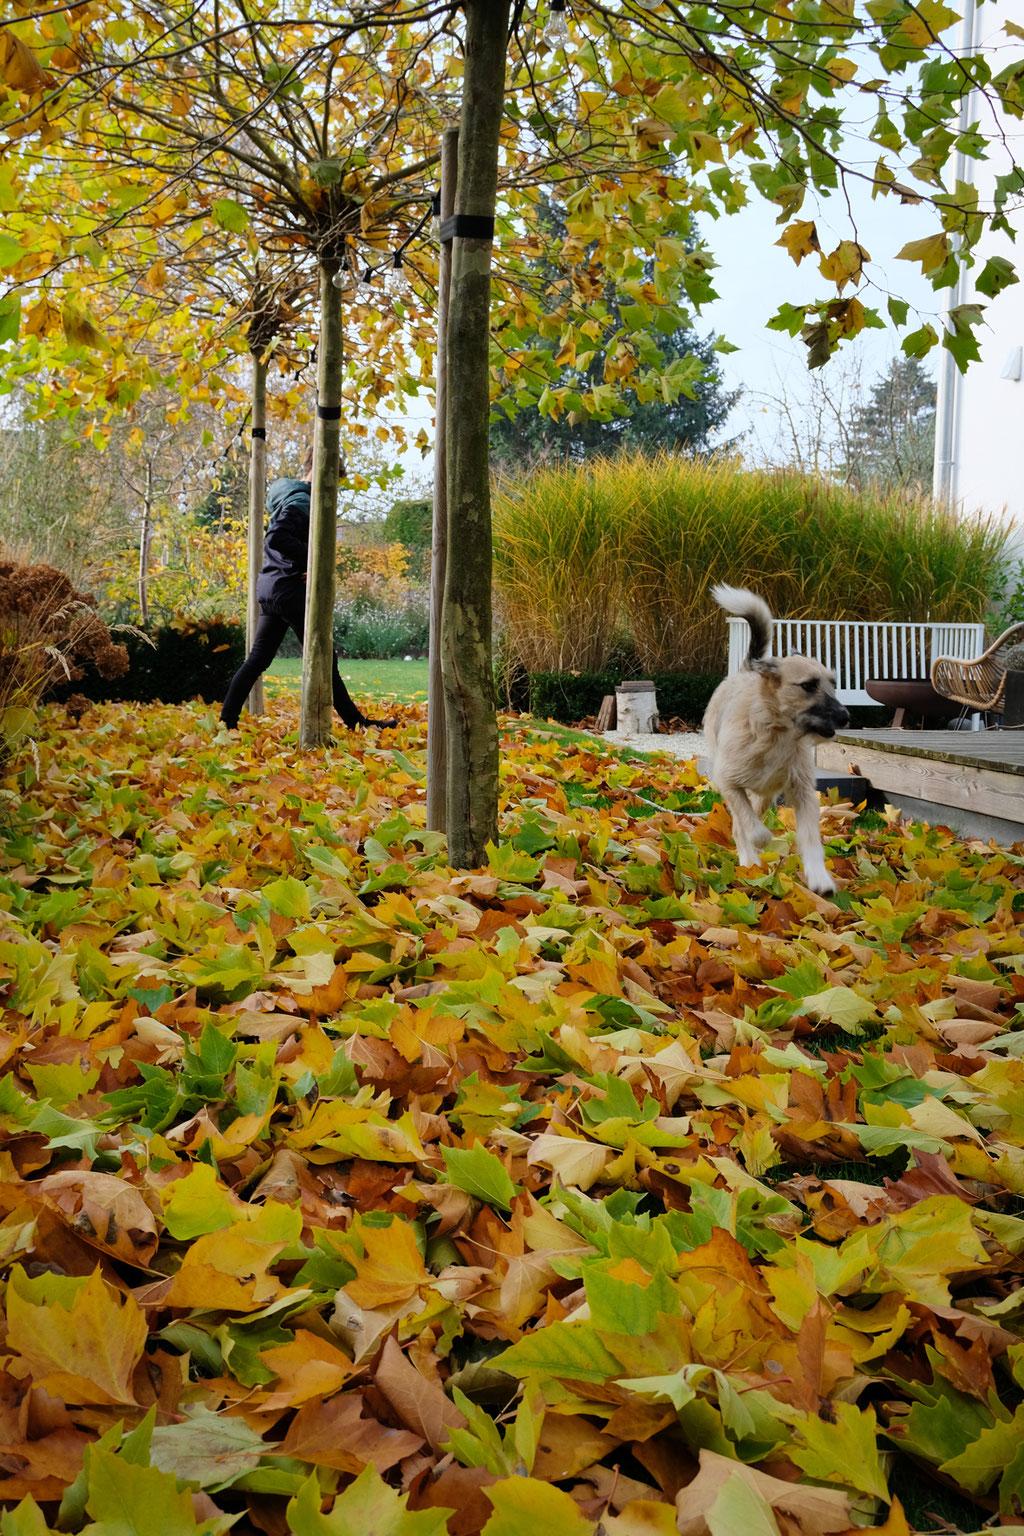 dieartigeGARTEN - Novembergarten | Platanen-Laub, Herbstlaub, goldener Herbst, Blattgold - Kind+Hund